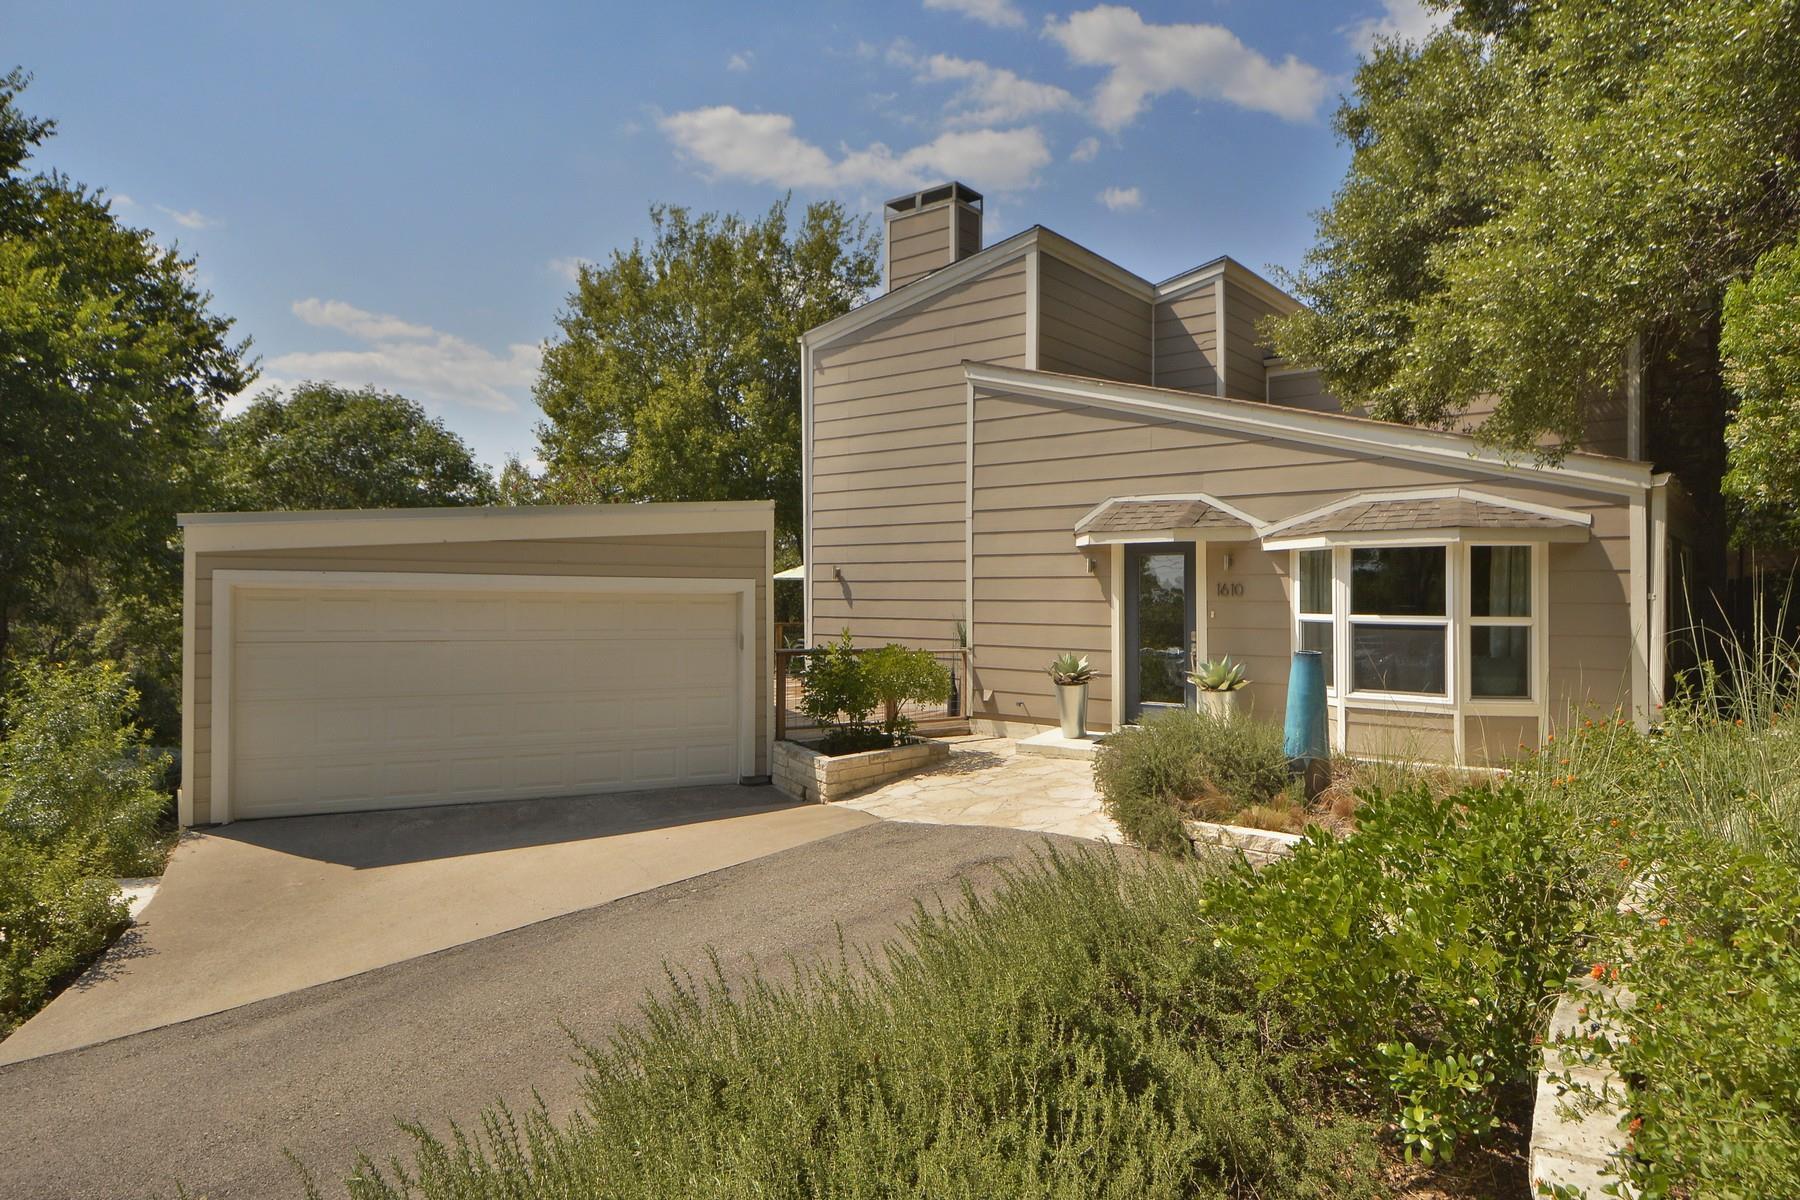 Residencial por un Venta en 1610 Wild Basin Street 1610 Wild Basin Street West Lake Hills, Texas 78746 Estados Unidos